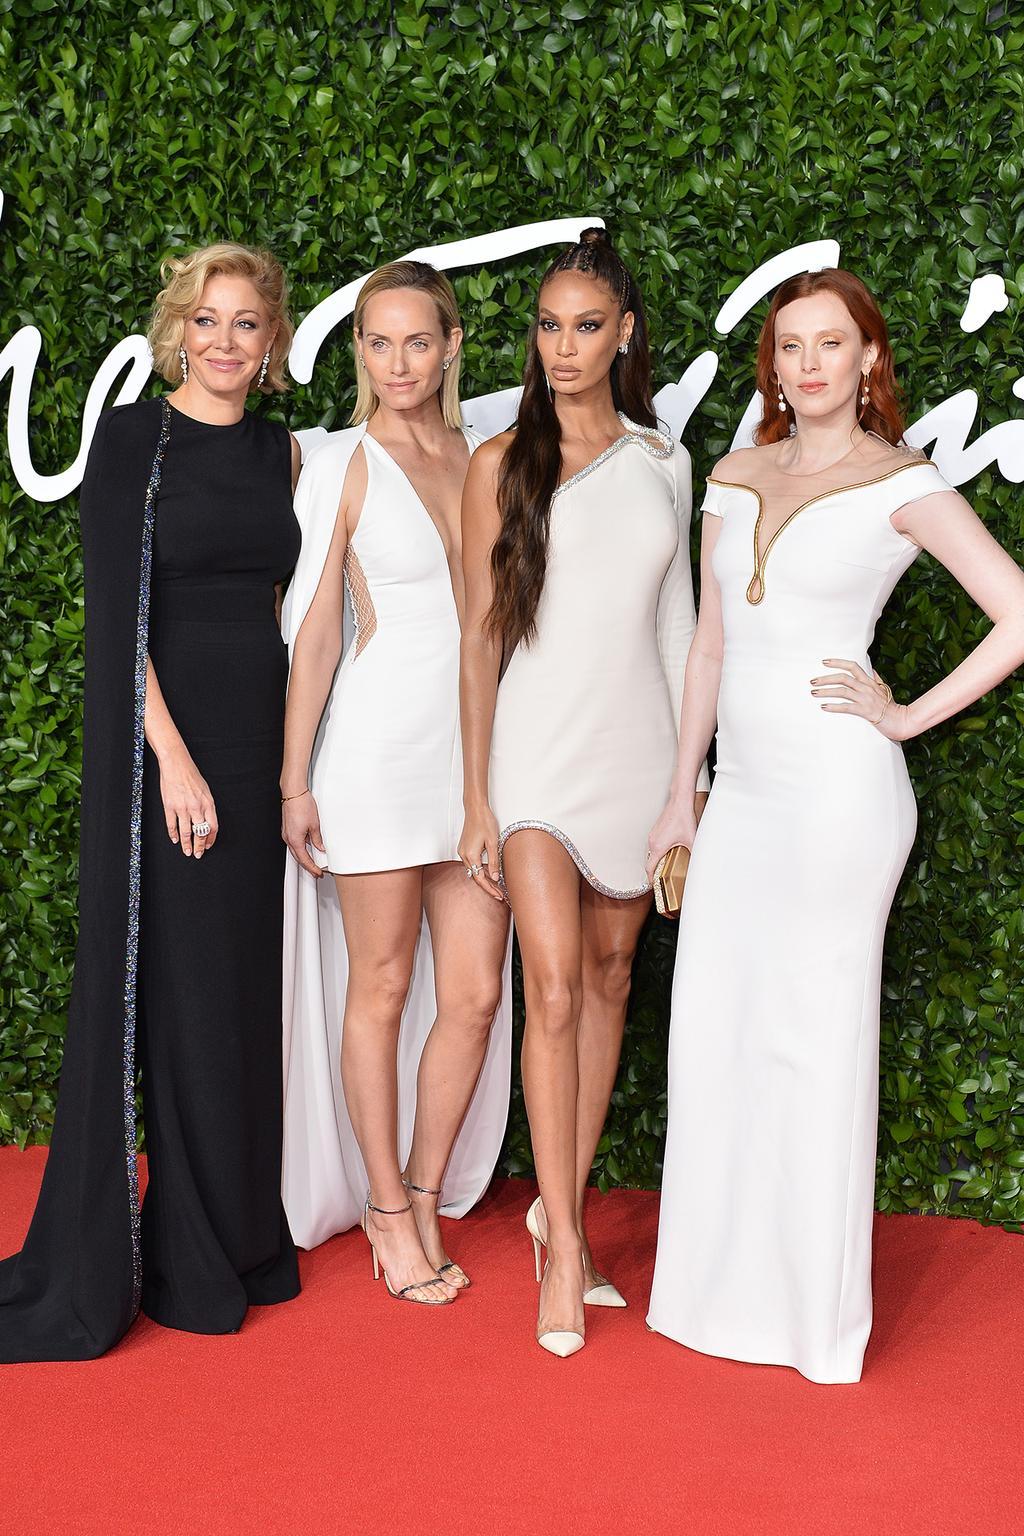 nadja-swarovski-amber-valletta-joan-smalls-karen-elson-2019-british-fashion-council-awards